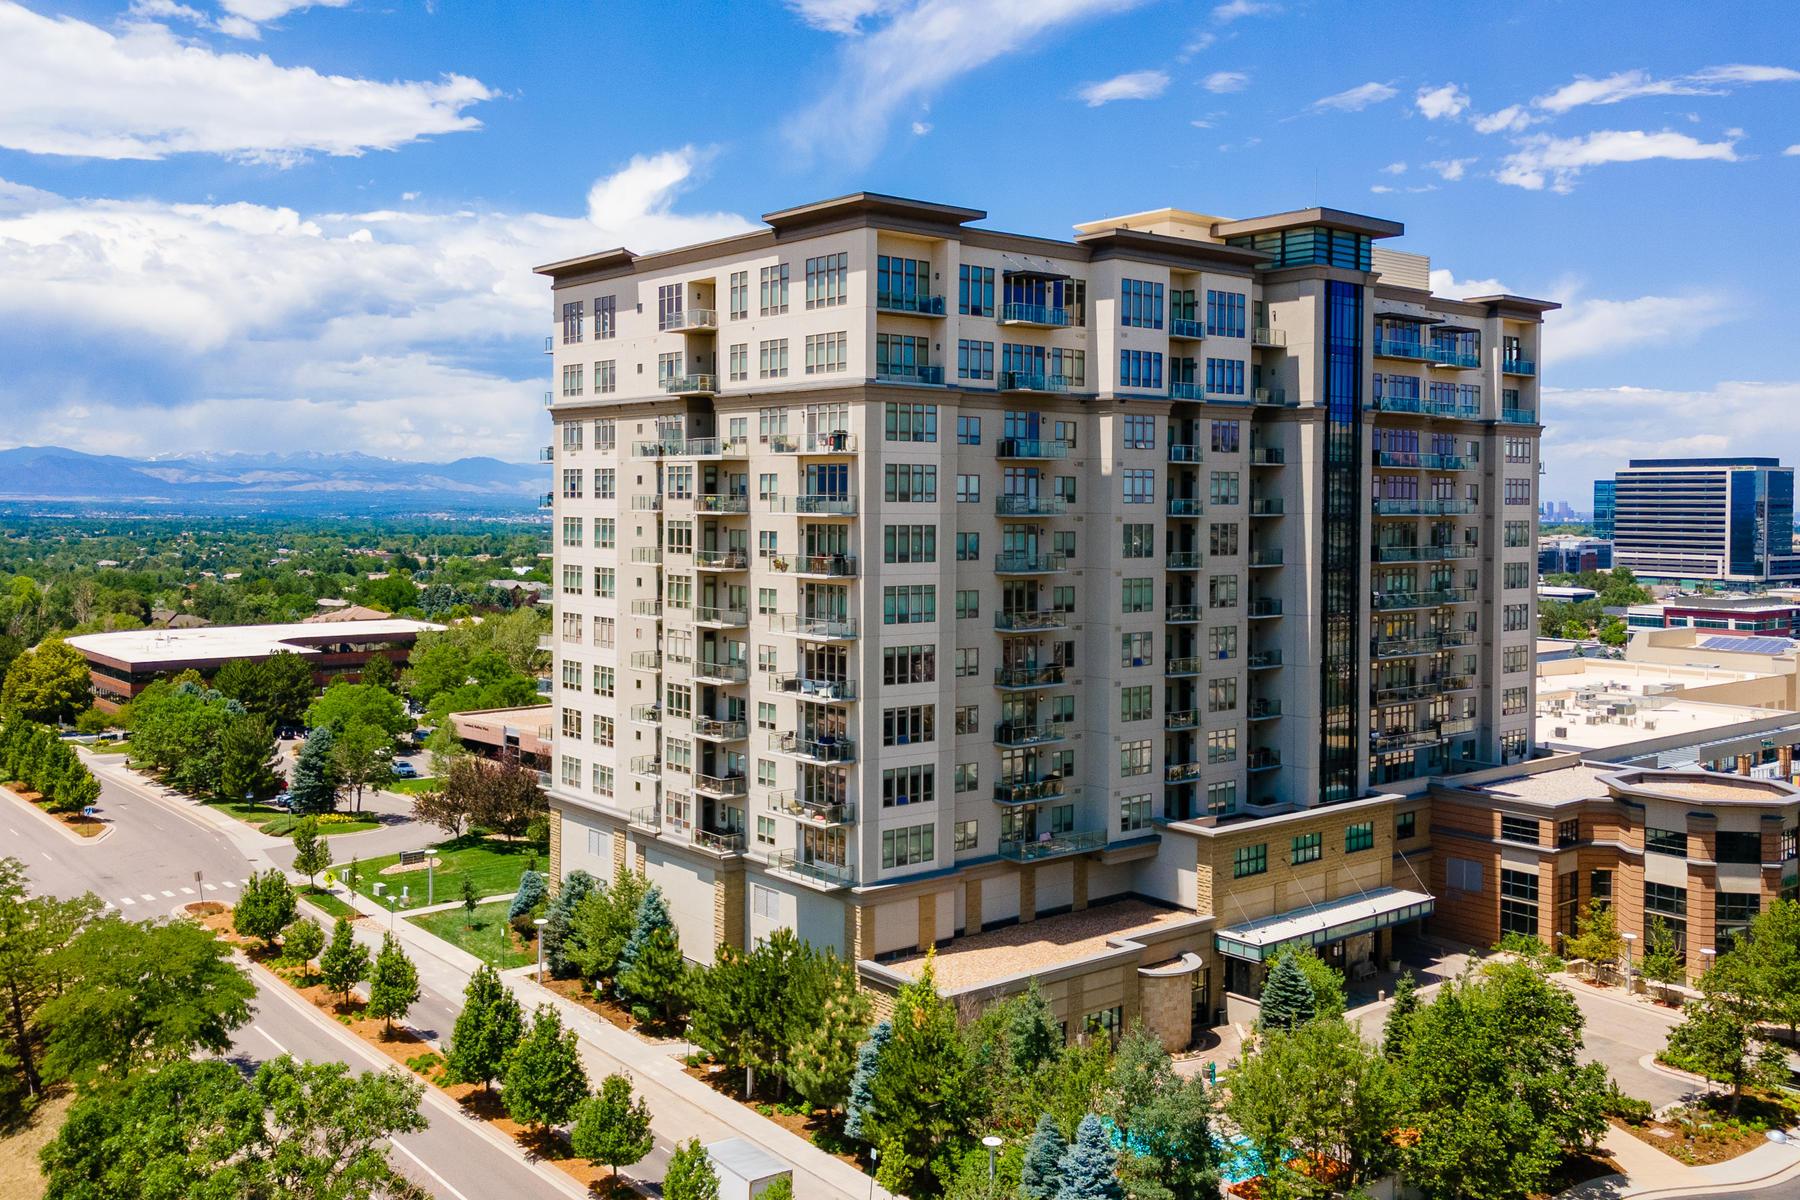 Condominiums for Active at 5455 Landmark Place Unit 1407 5455 Landmark Place, Unit 1407 Greenwood Village, Colorado 80111 United States